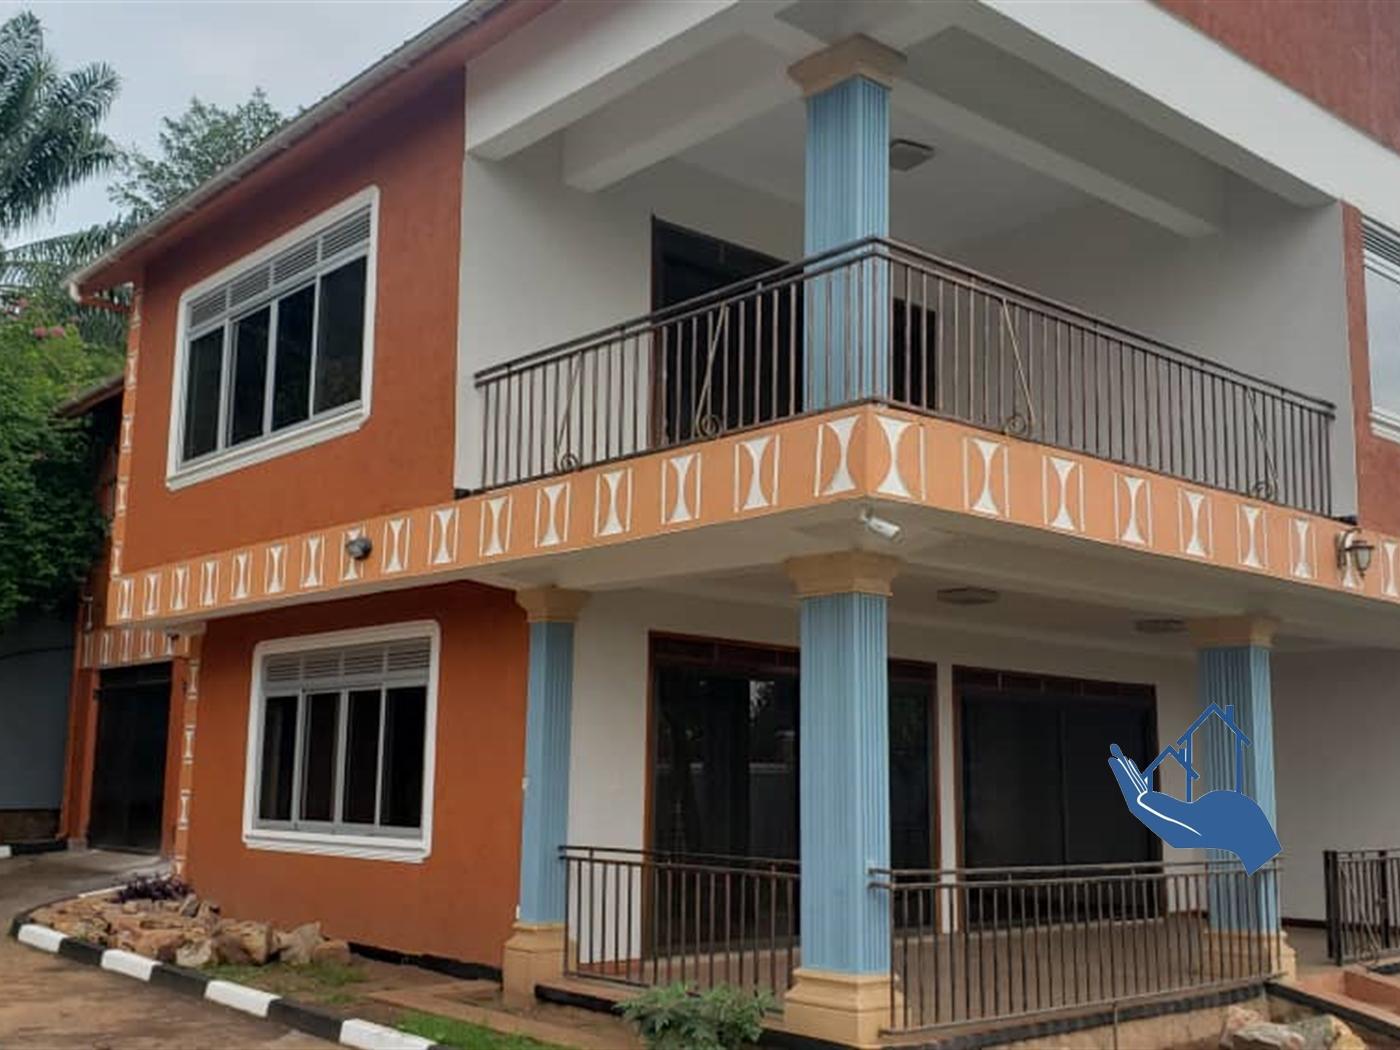 Storyed house for rent in Kansanga Kampala